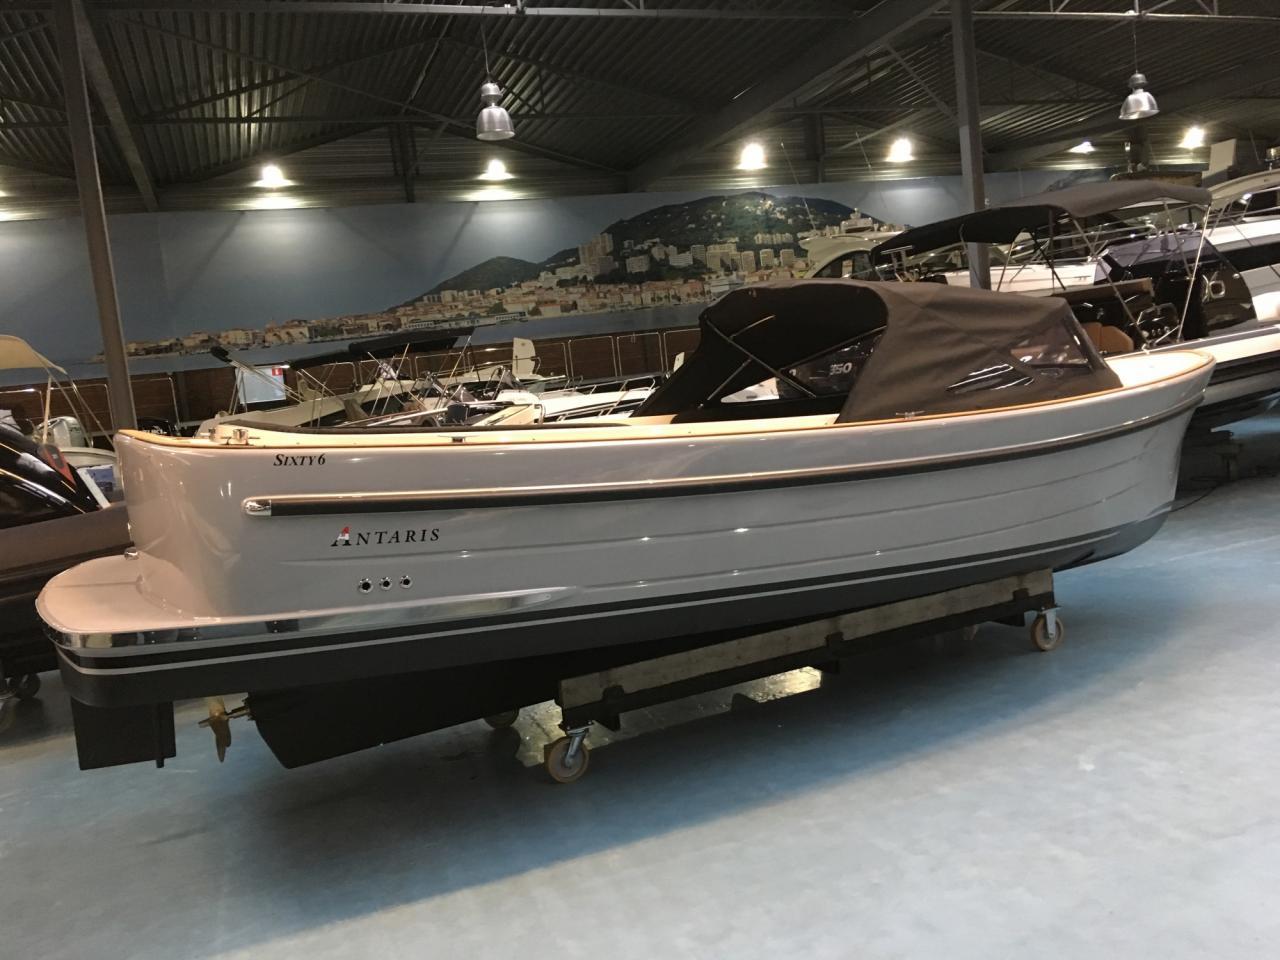 Antaris sixty6 grijs met 42 pk Vetus 6